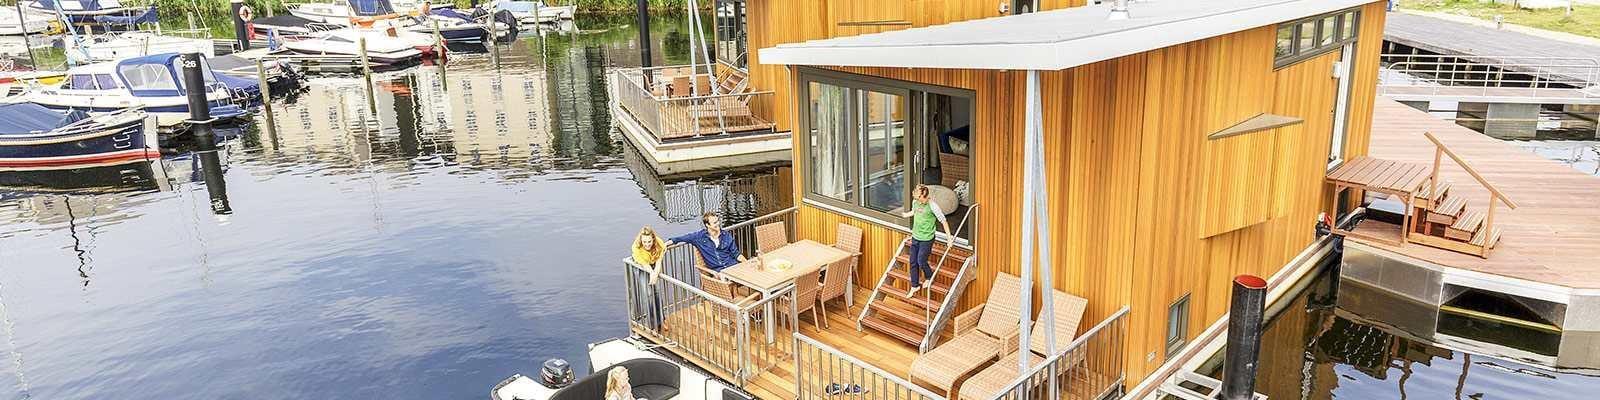 Ferien auf dem Hausboot bei Center Parcs